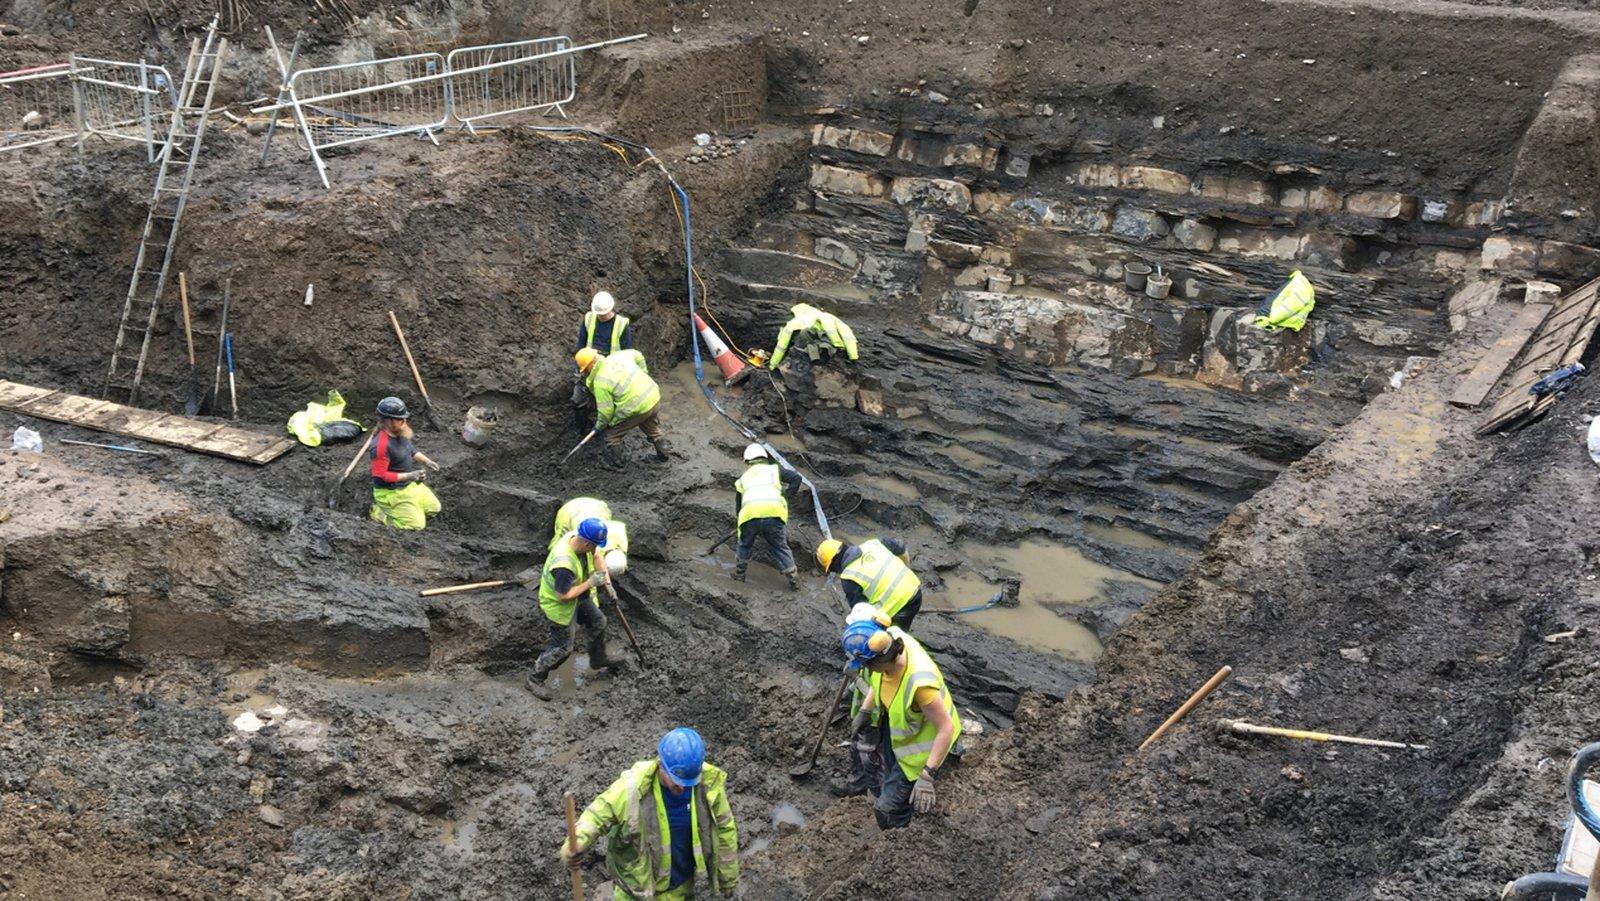 Dublin's earliest Viking settlement seen in new light